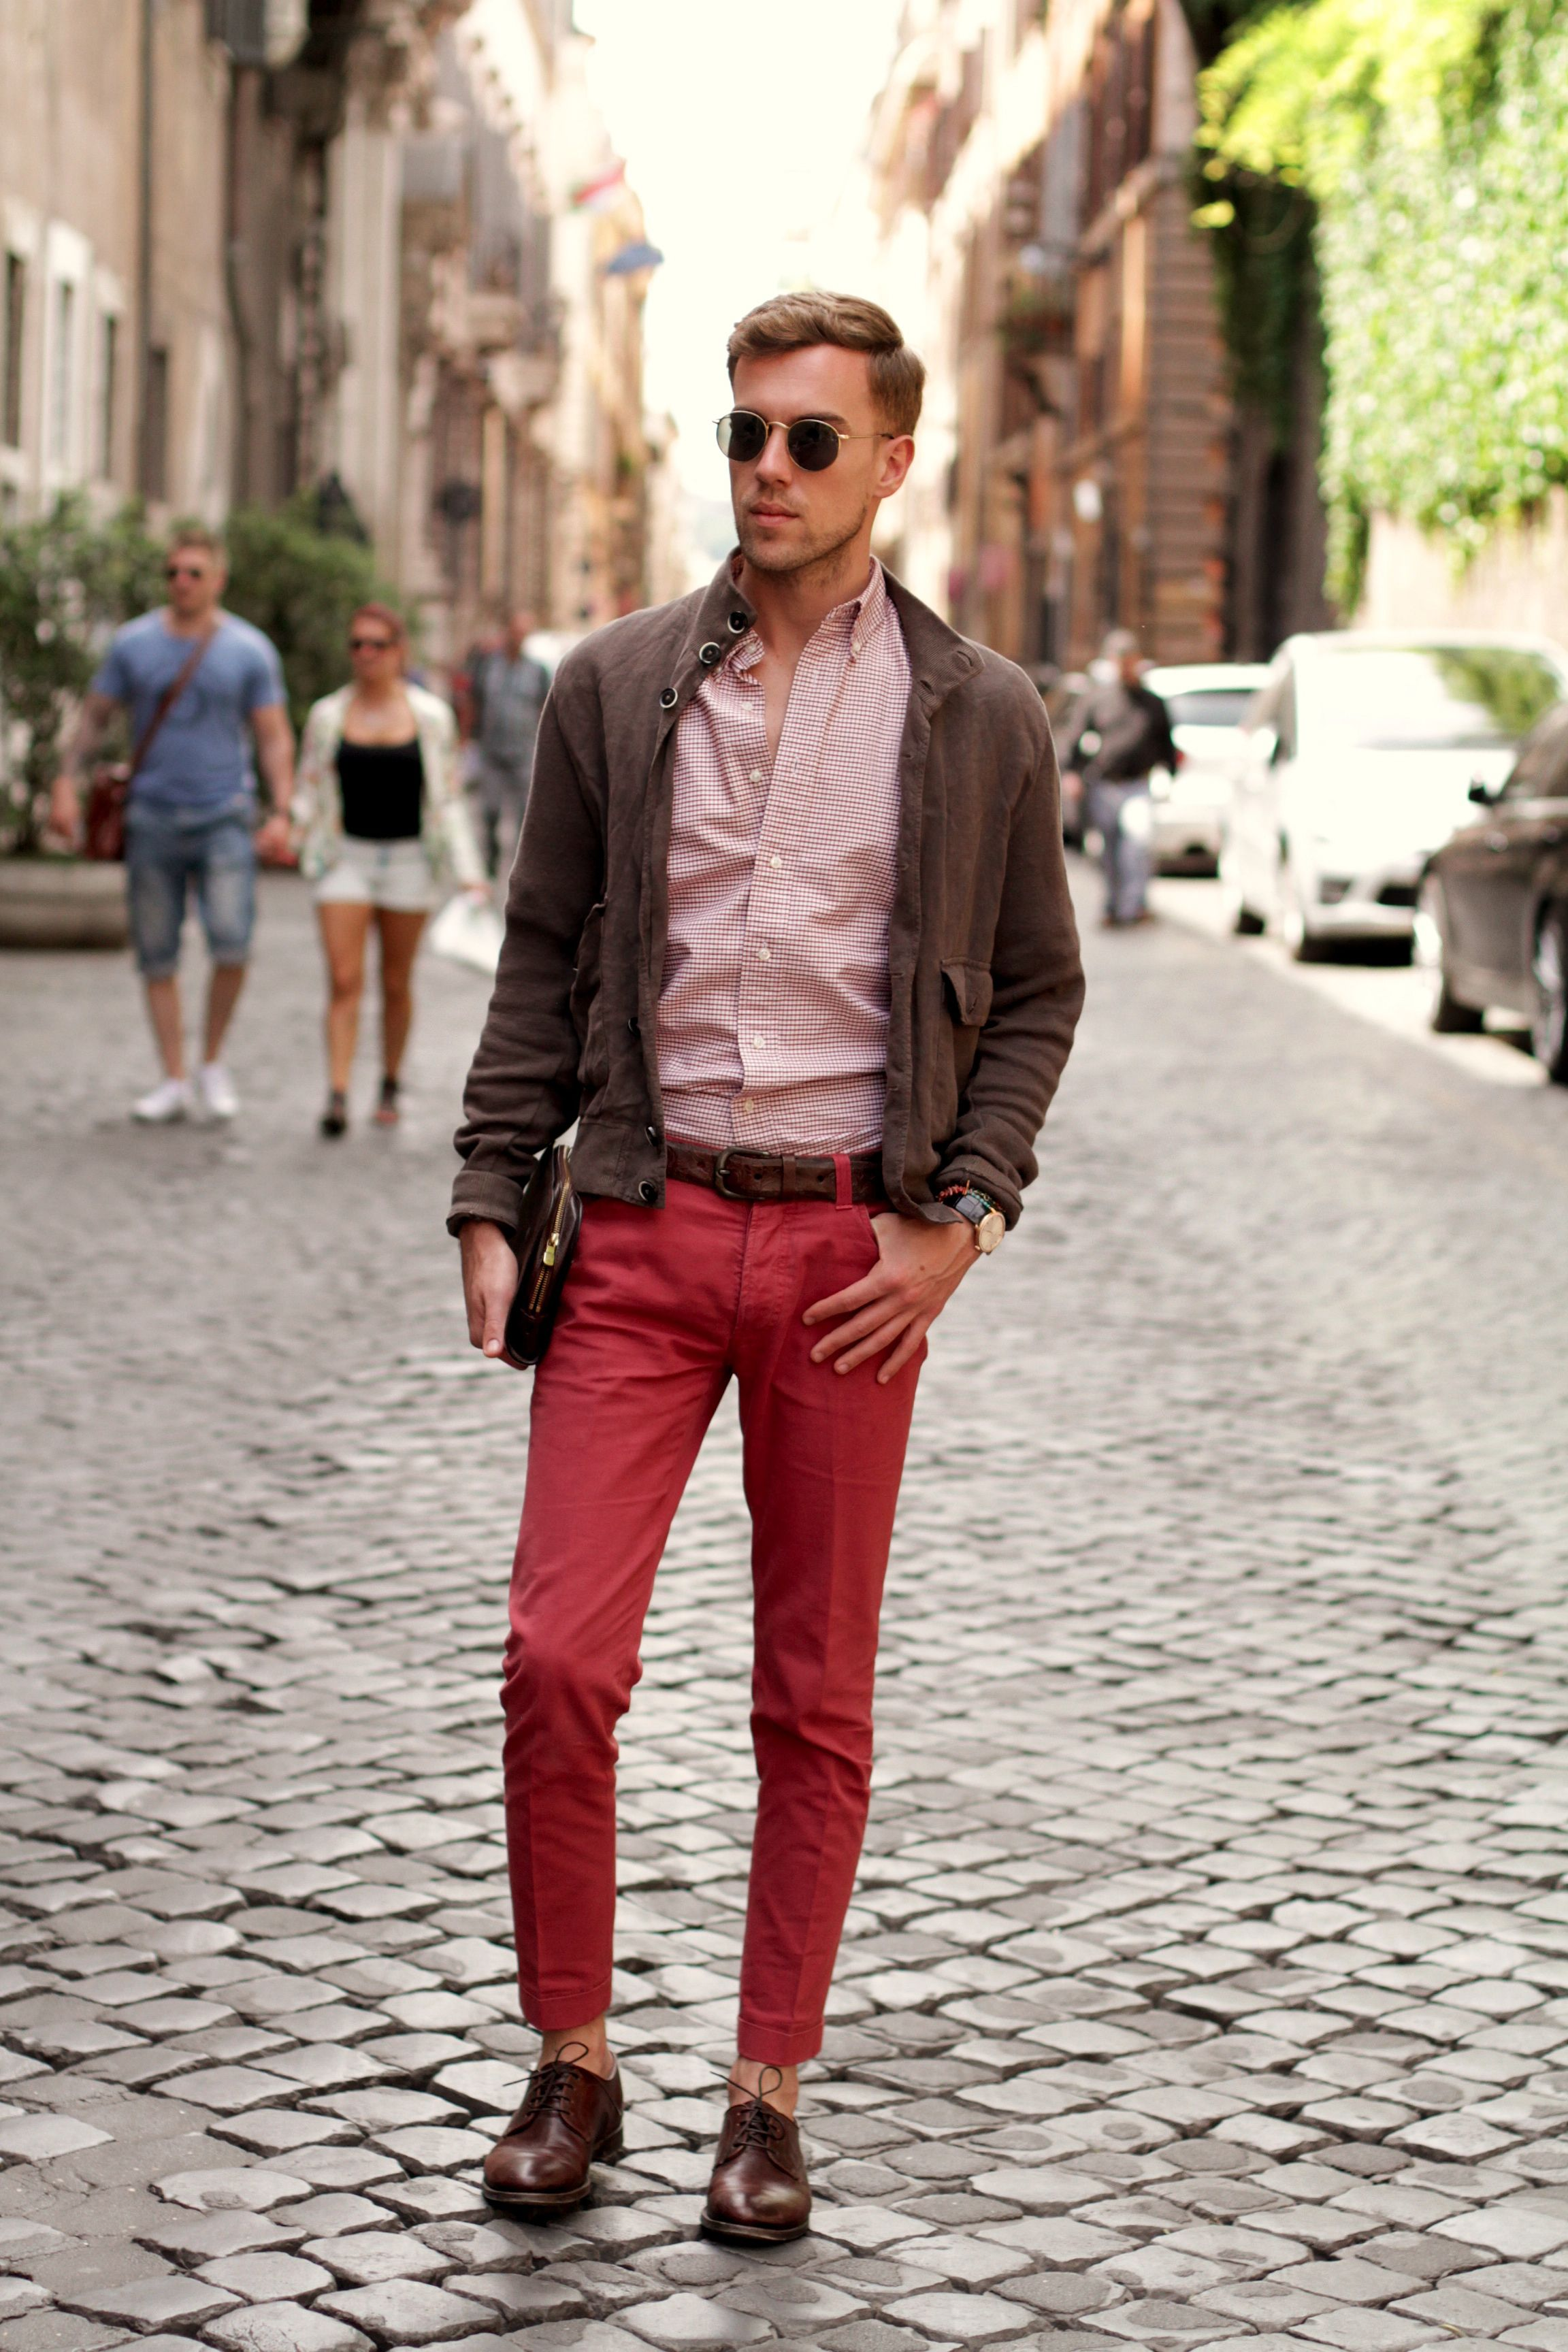 7a972efdd22 Filippo Cirulli of TheThreeF  fashion  blog is wearing Fabi shoes in  Rome.